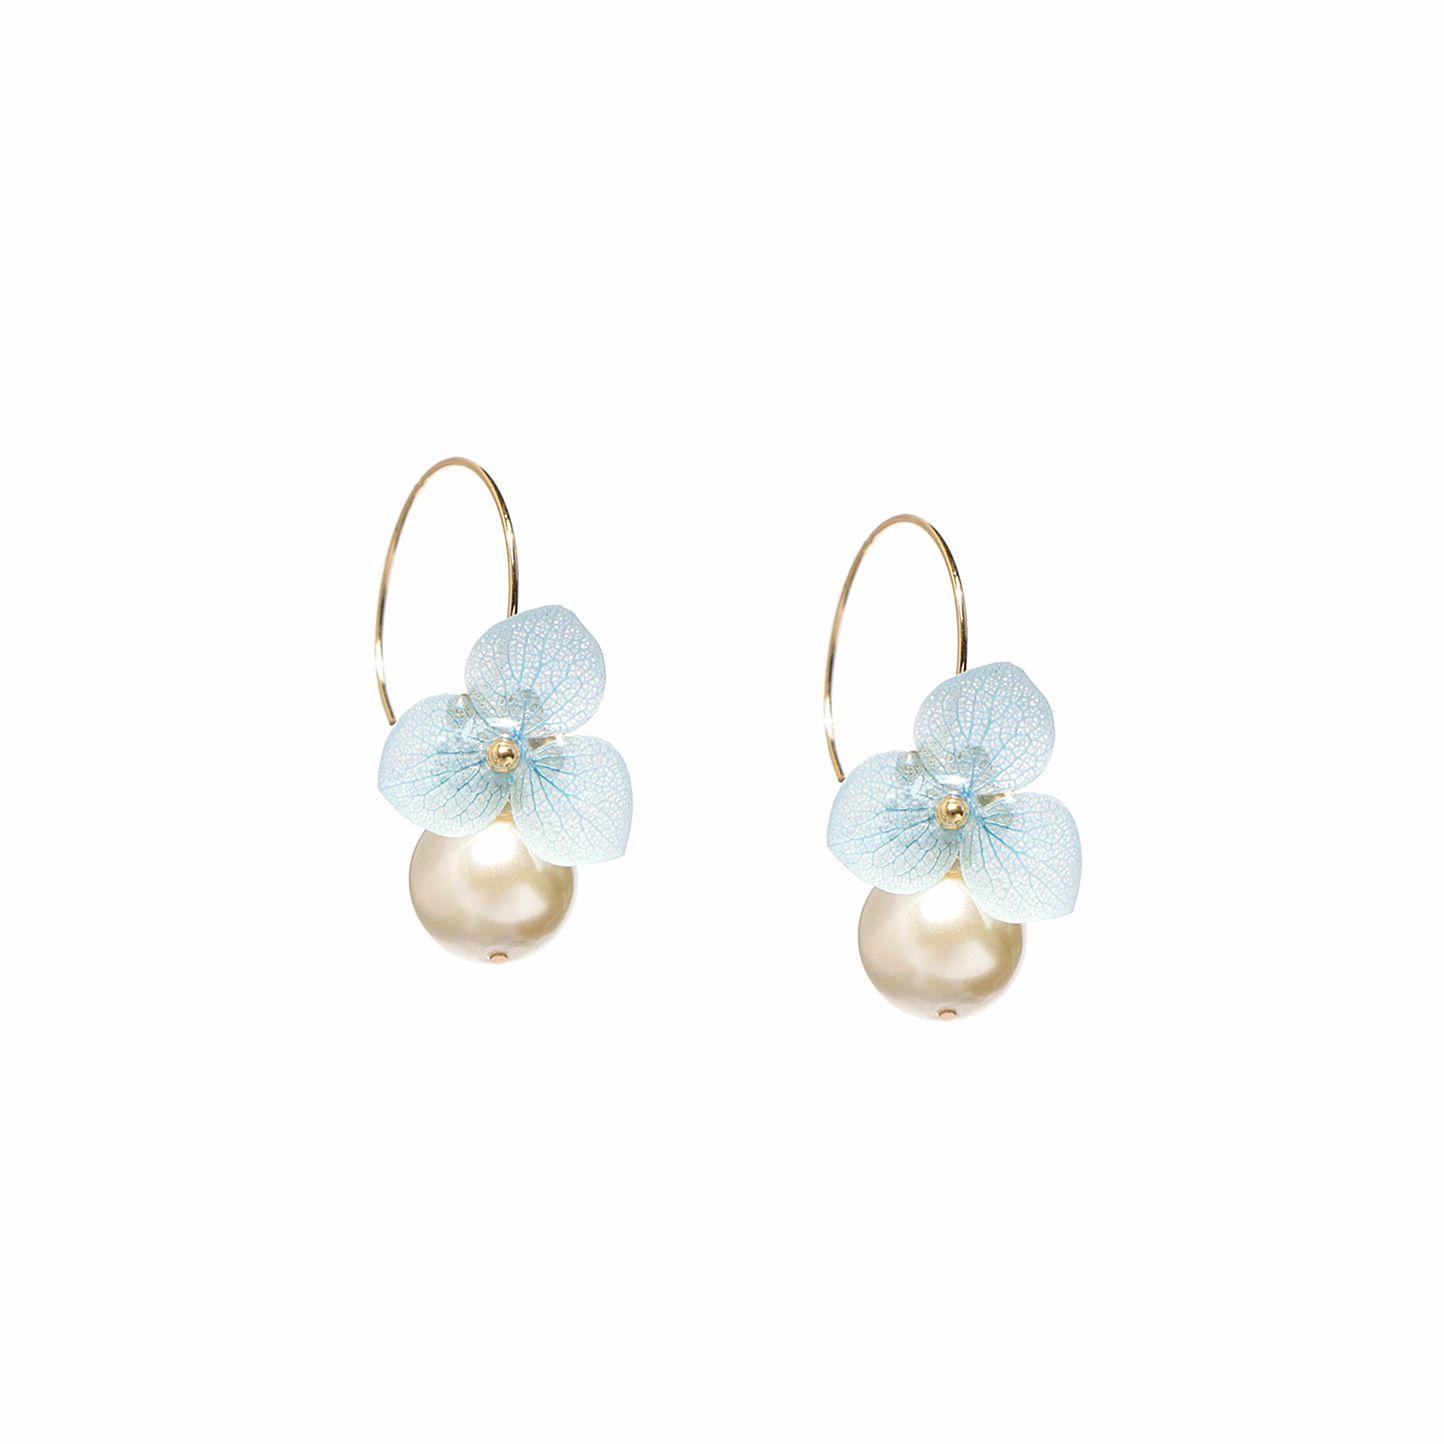 Flower earrings on a white background.